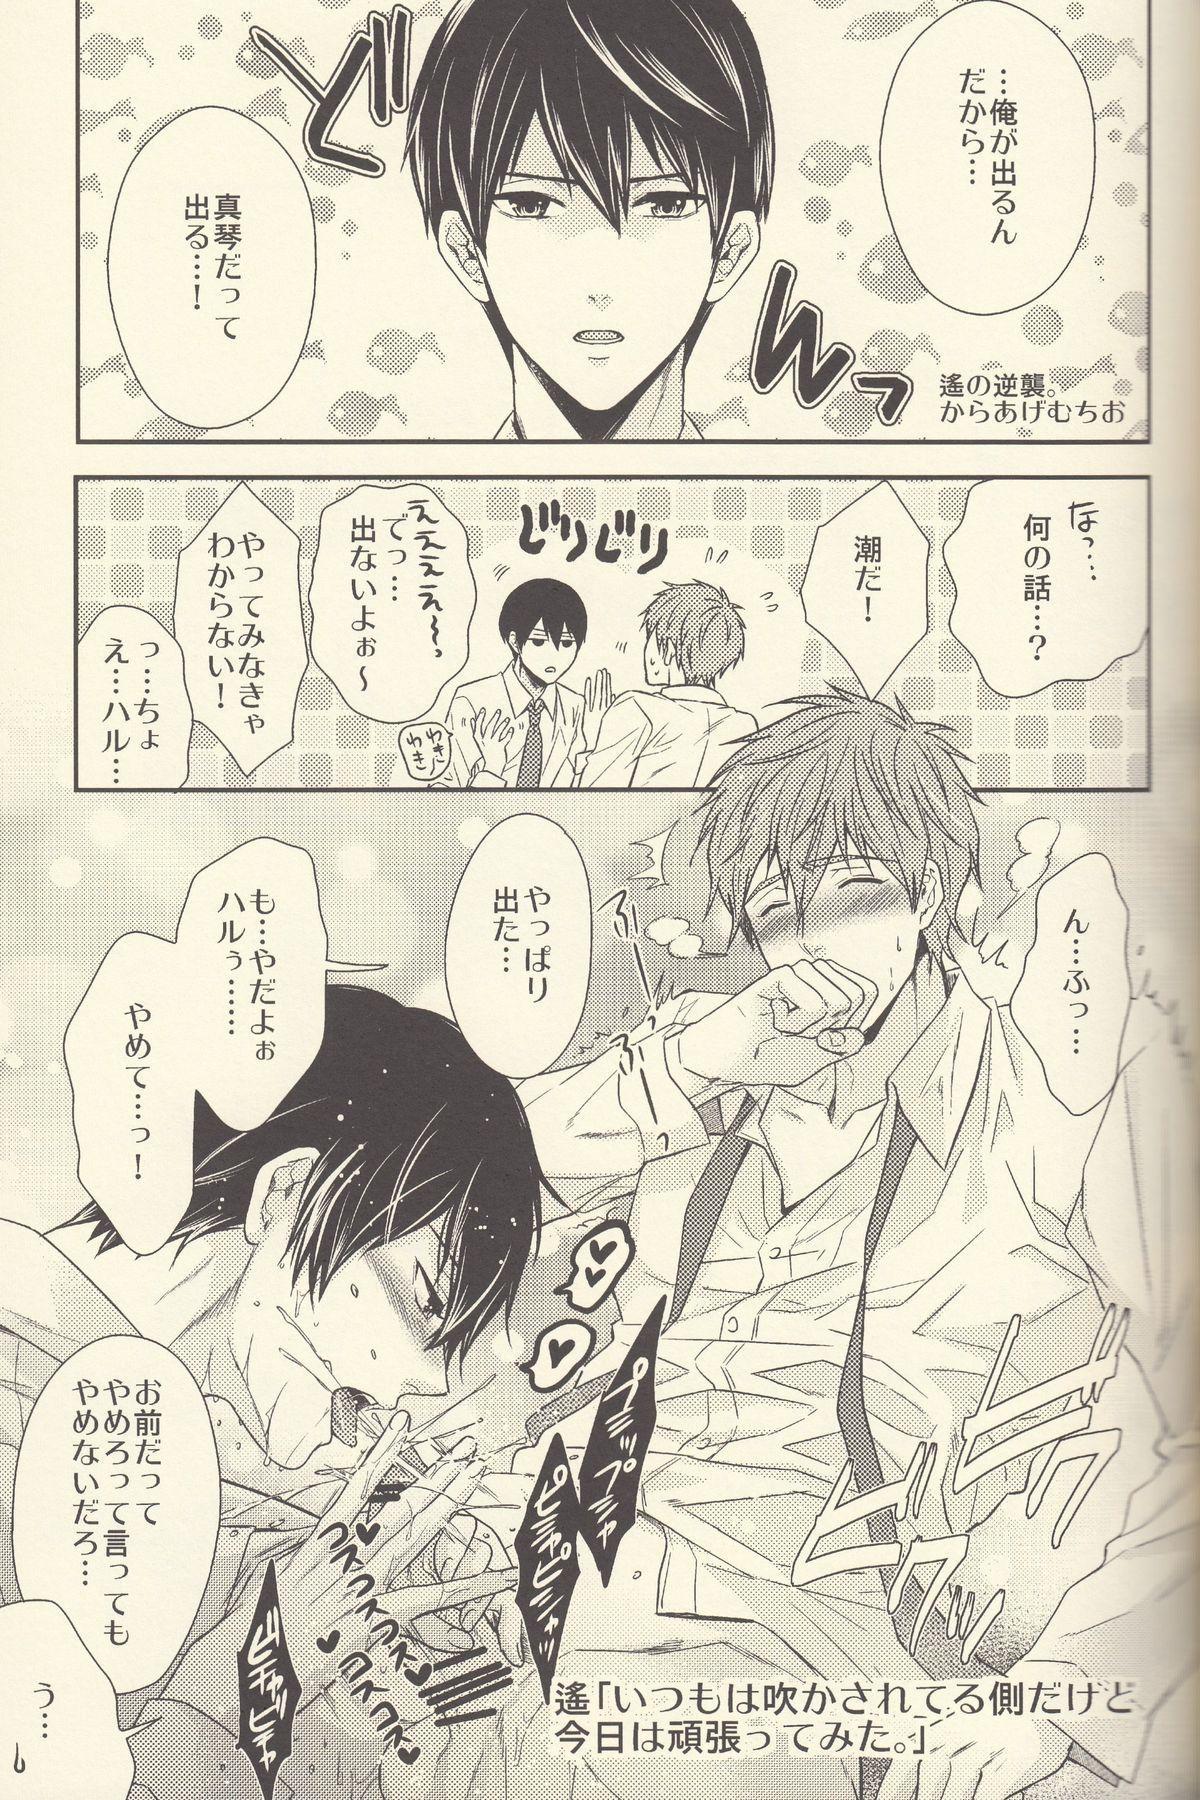 Shiofuki no Friendship - Makoto ♥ Haruka Squirting Anthology 24